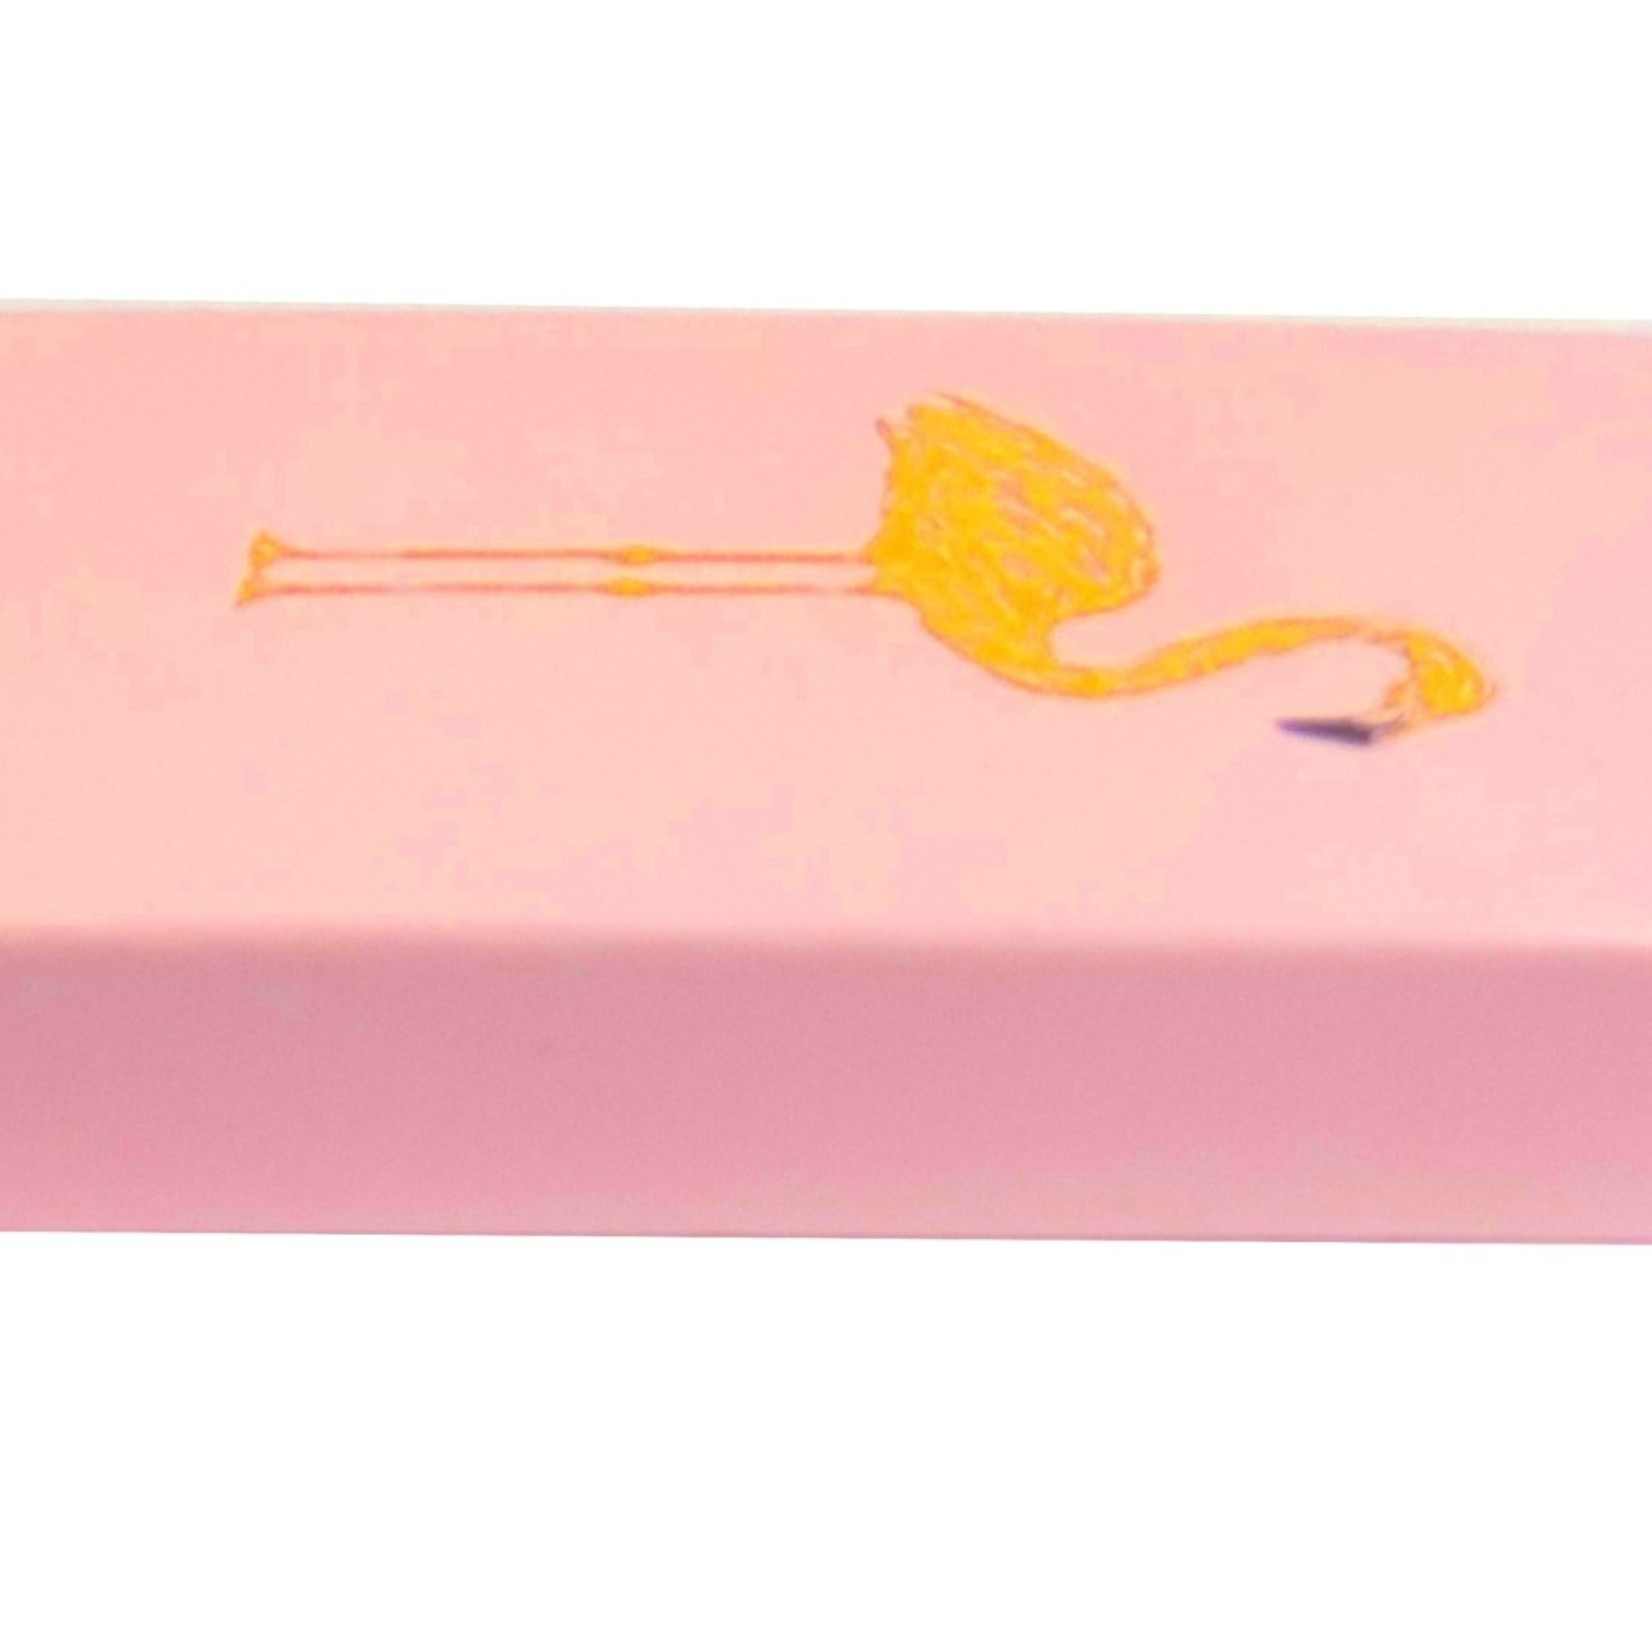 The Joy of Light Joy of Light Matchbook Flamingo